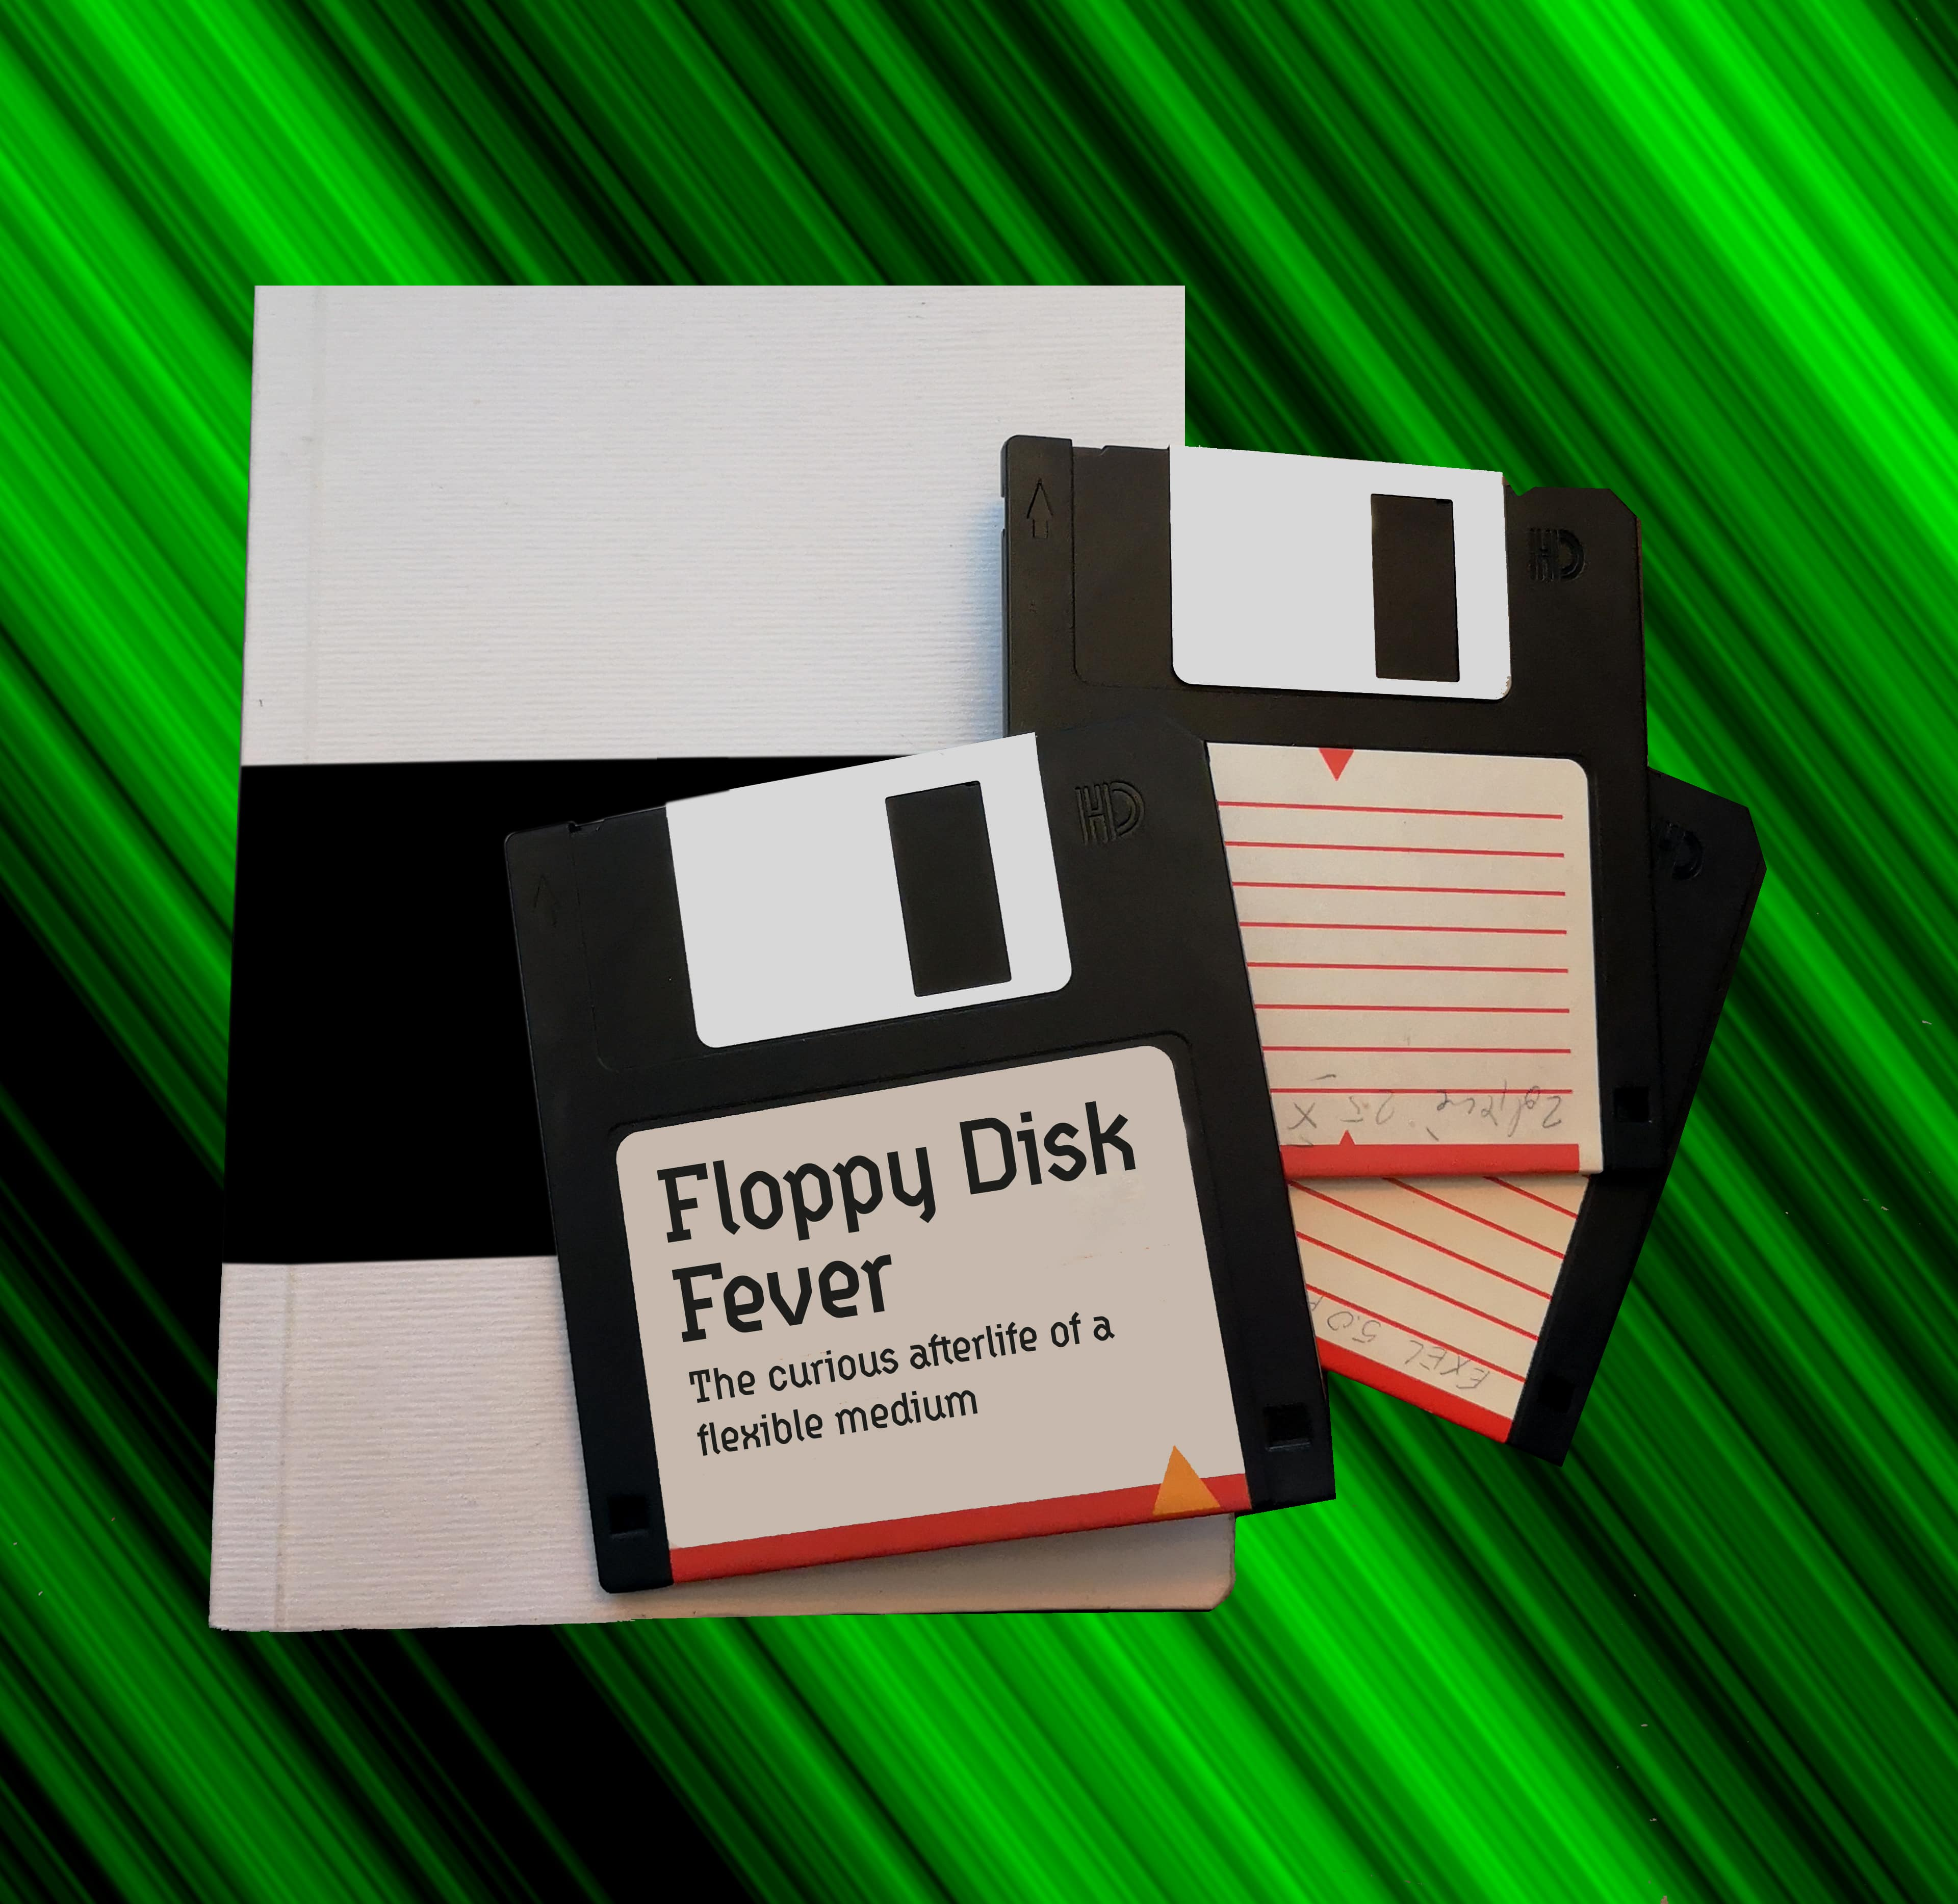 985301floppydiskfever.jpeg